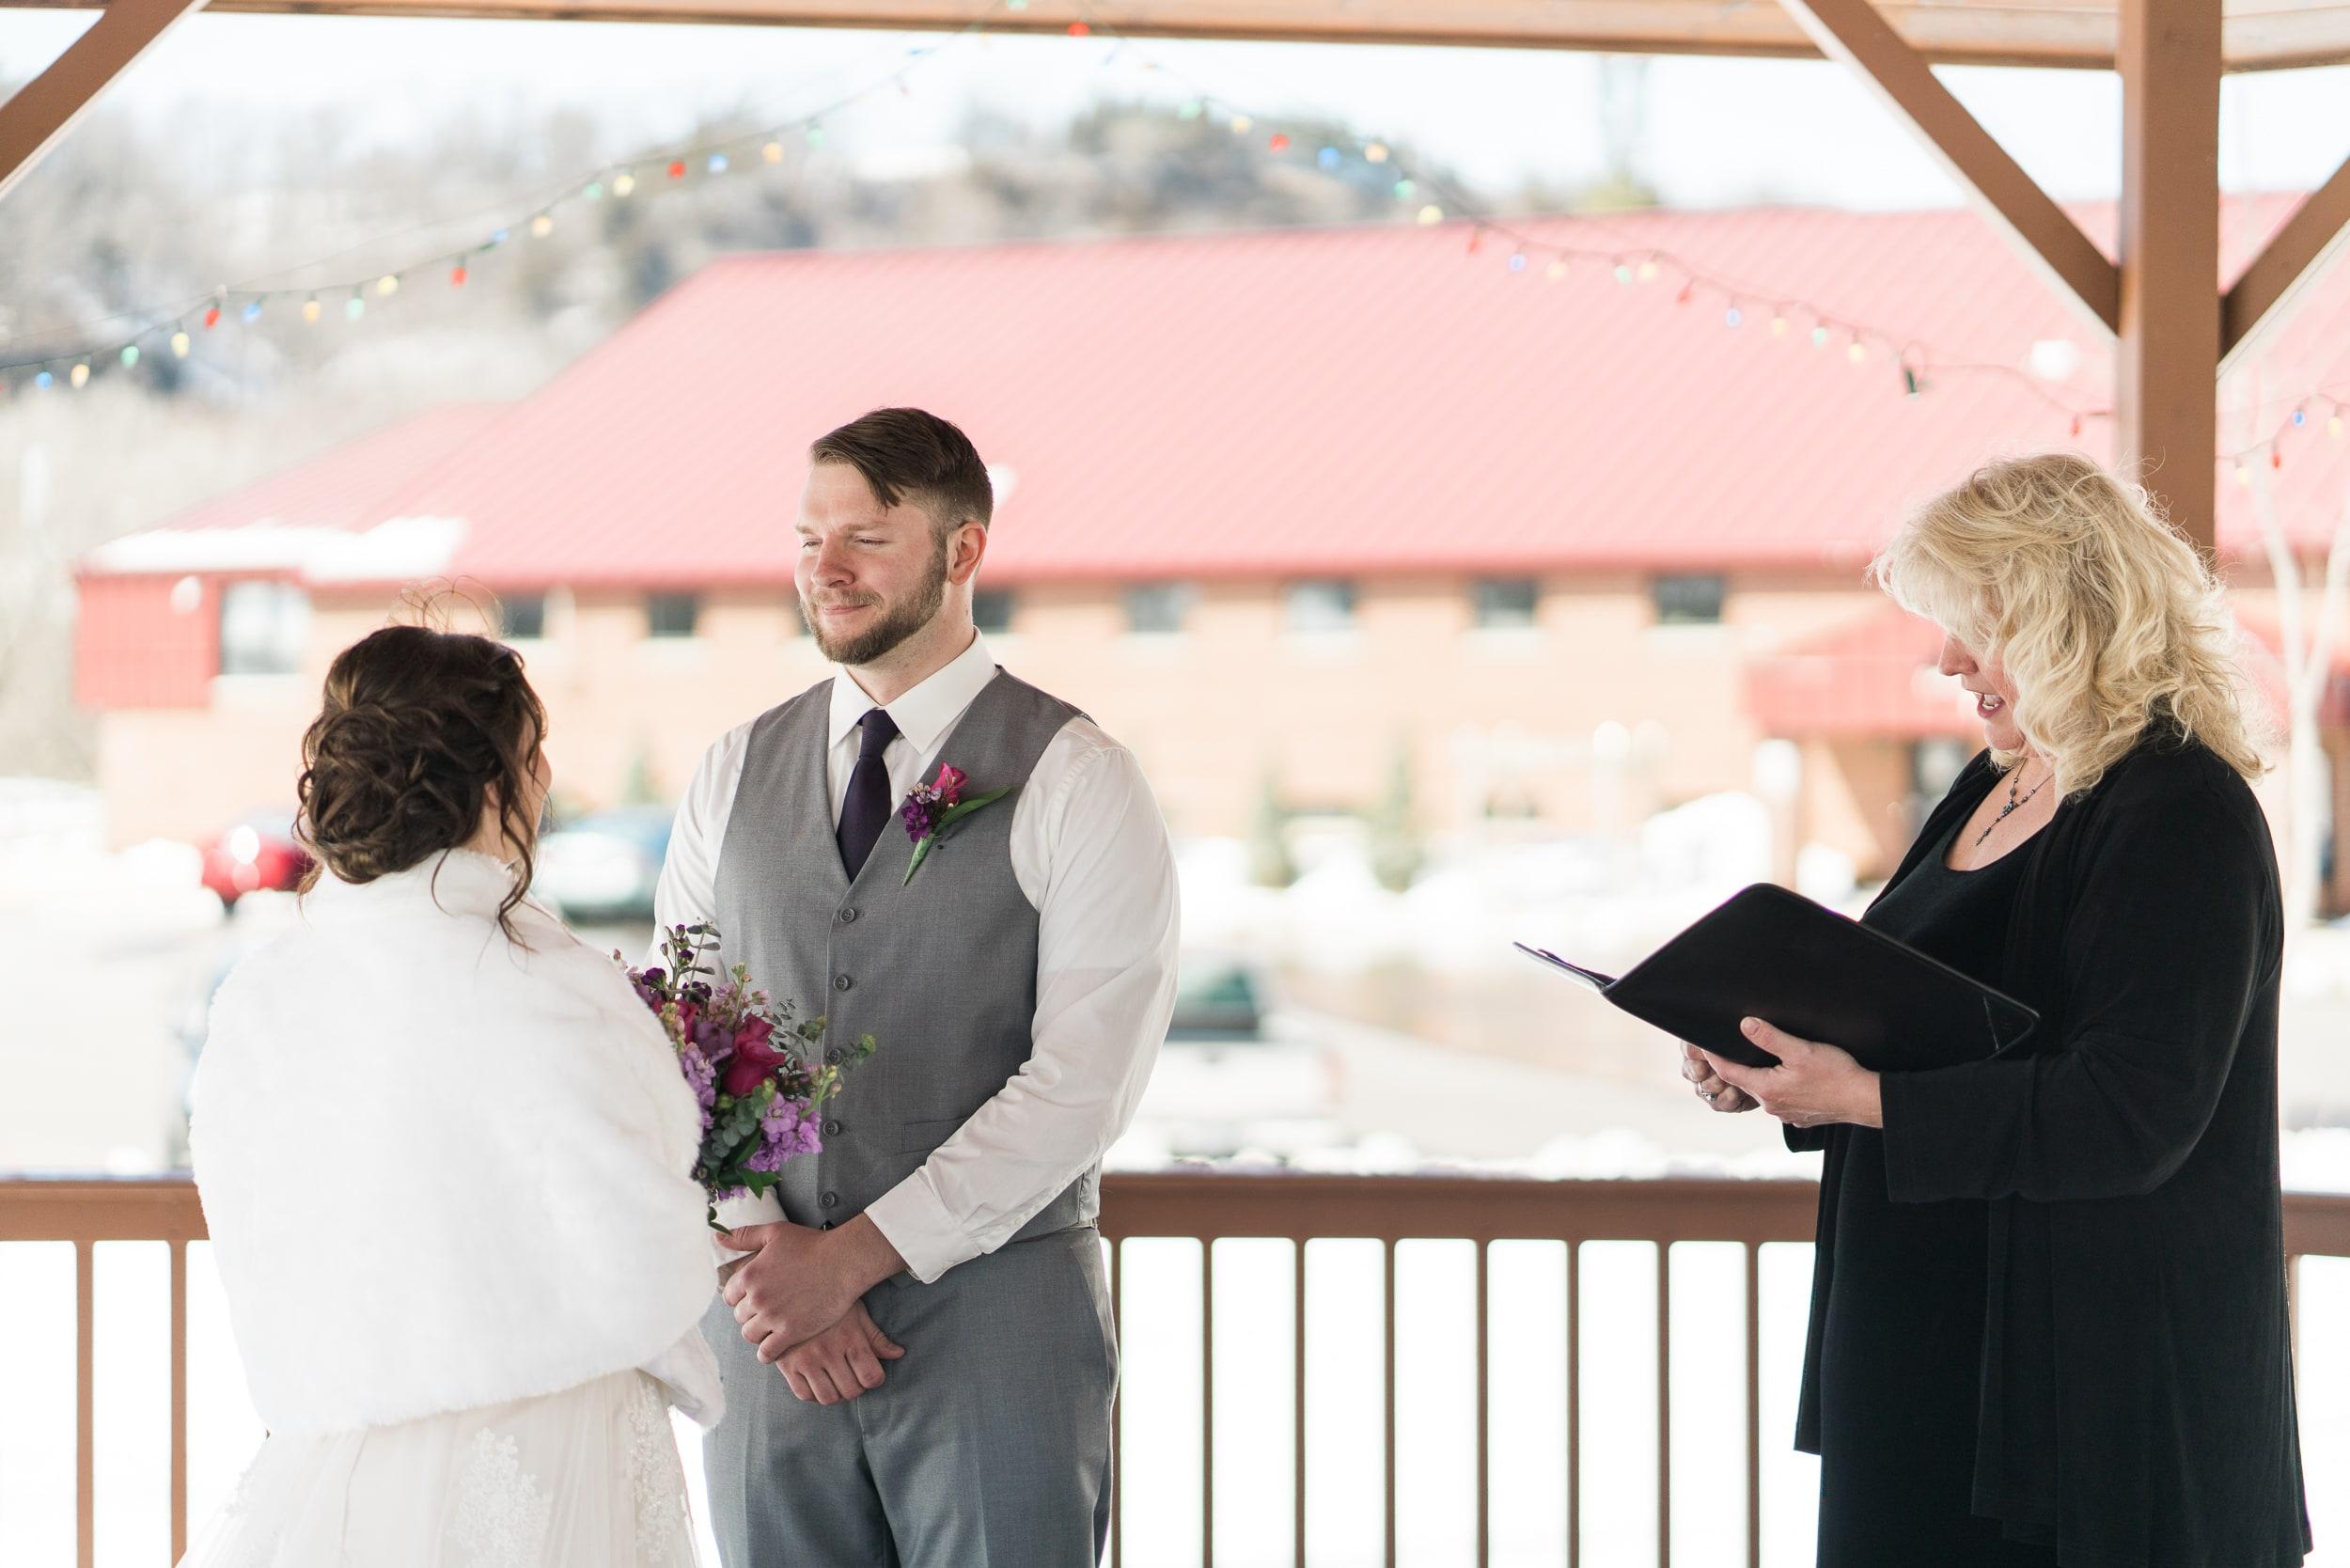 snowy-intimate-wedding-28.jpg